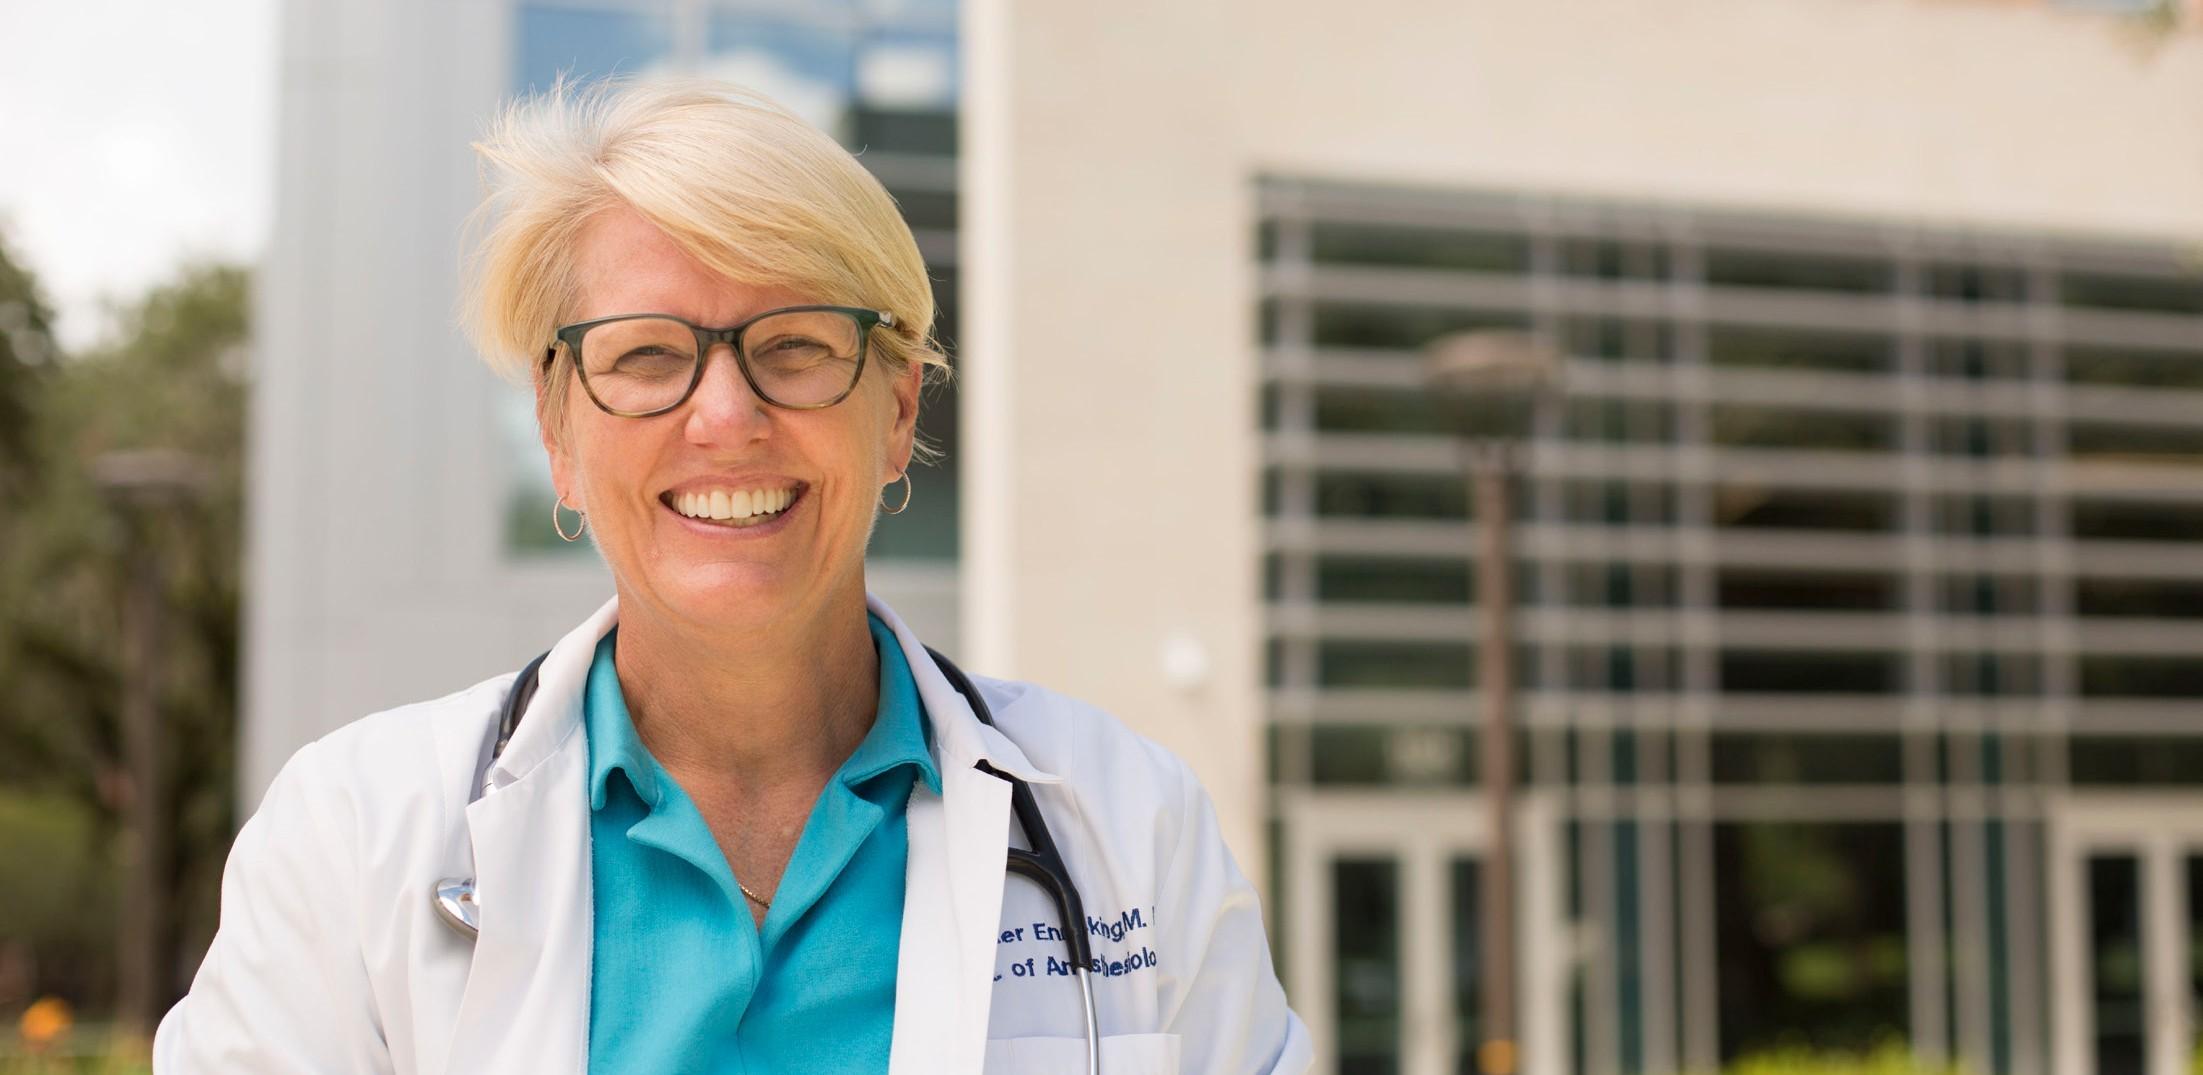 Dr Kayser Enneking